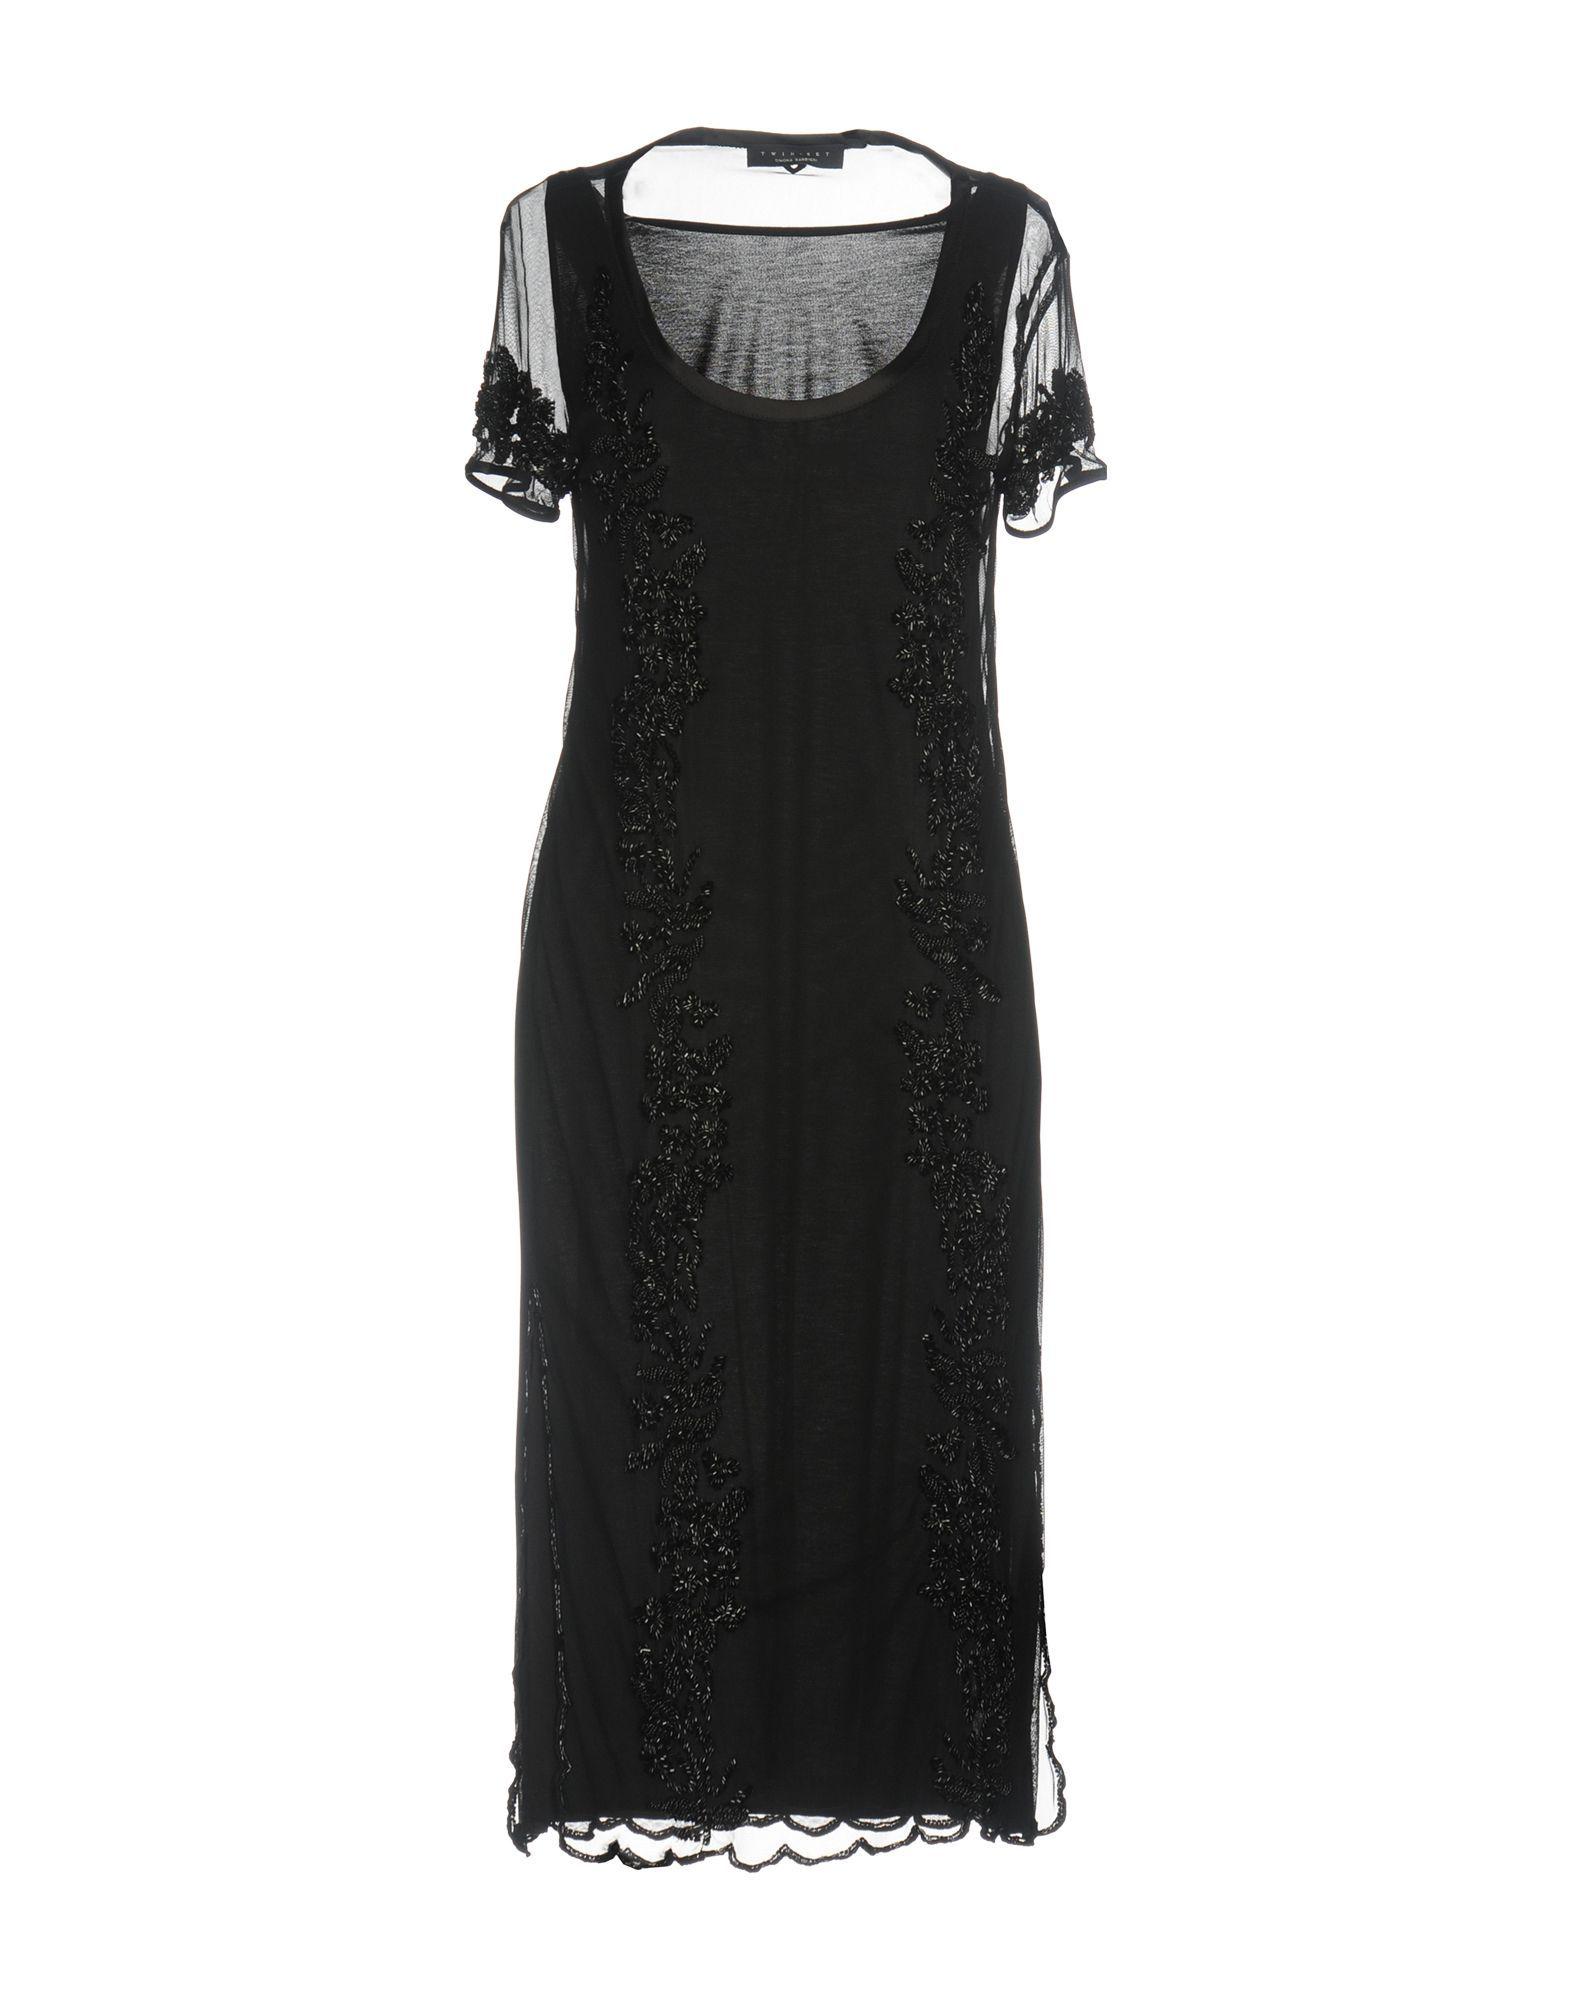 Twinset Black Beaded Short Sleeve Dress